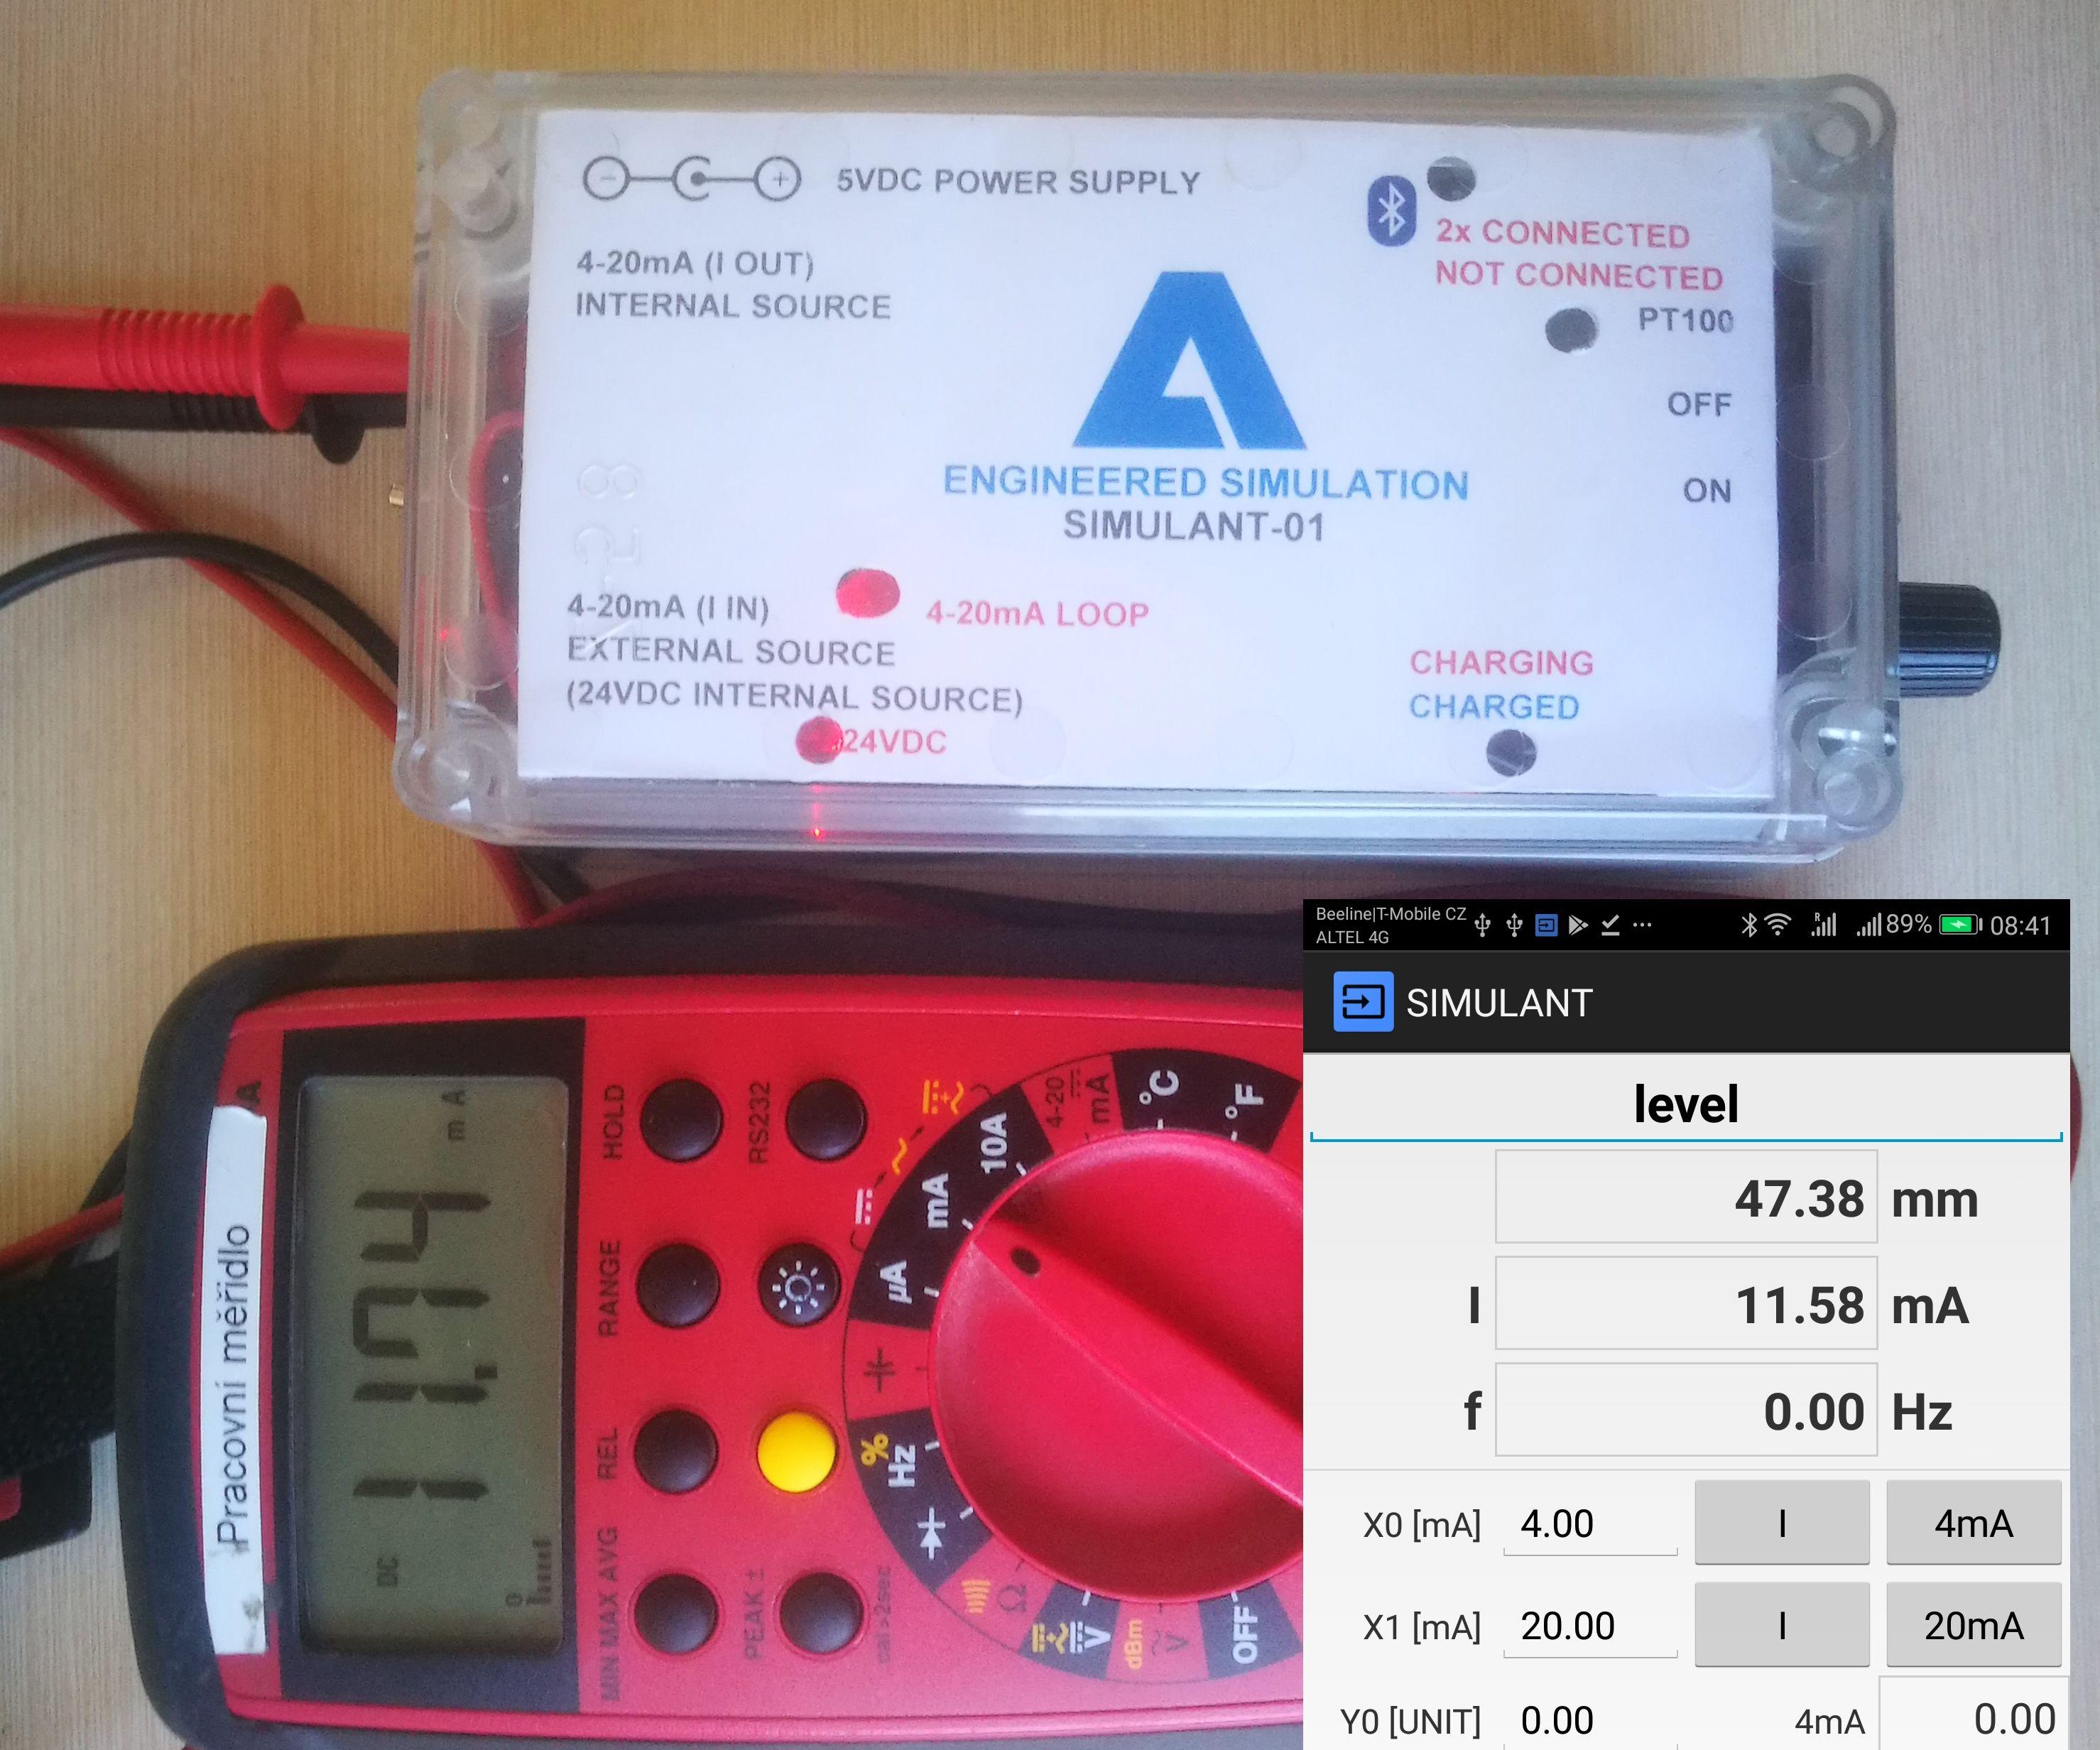 SIMULANT - Remotely Controlled Multi Purpose Simulator 4-20mA, PT100, Pulse Generator and Counter